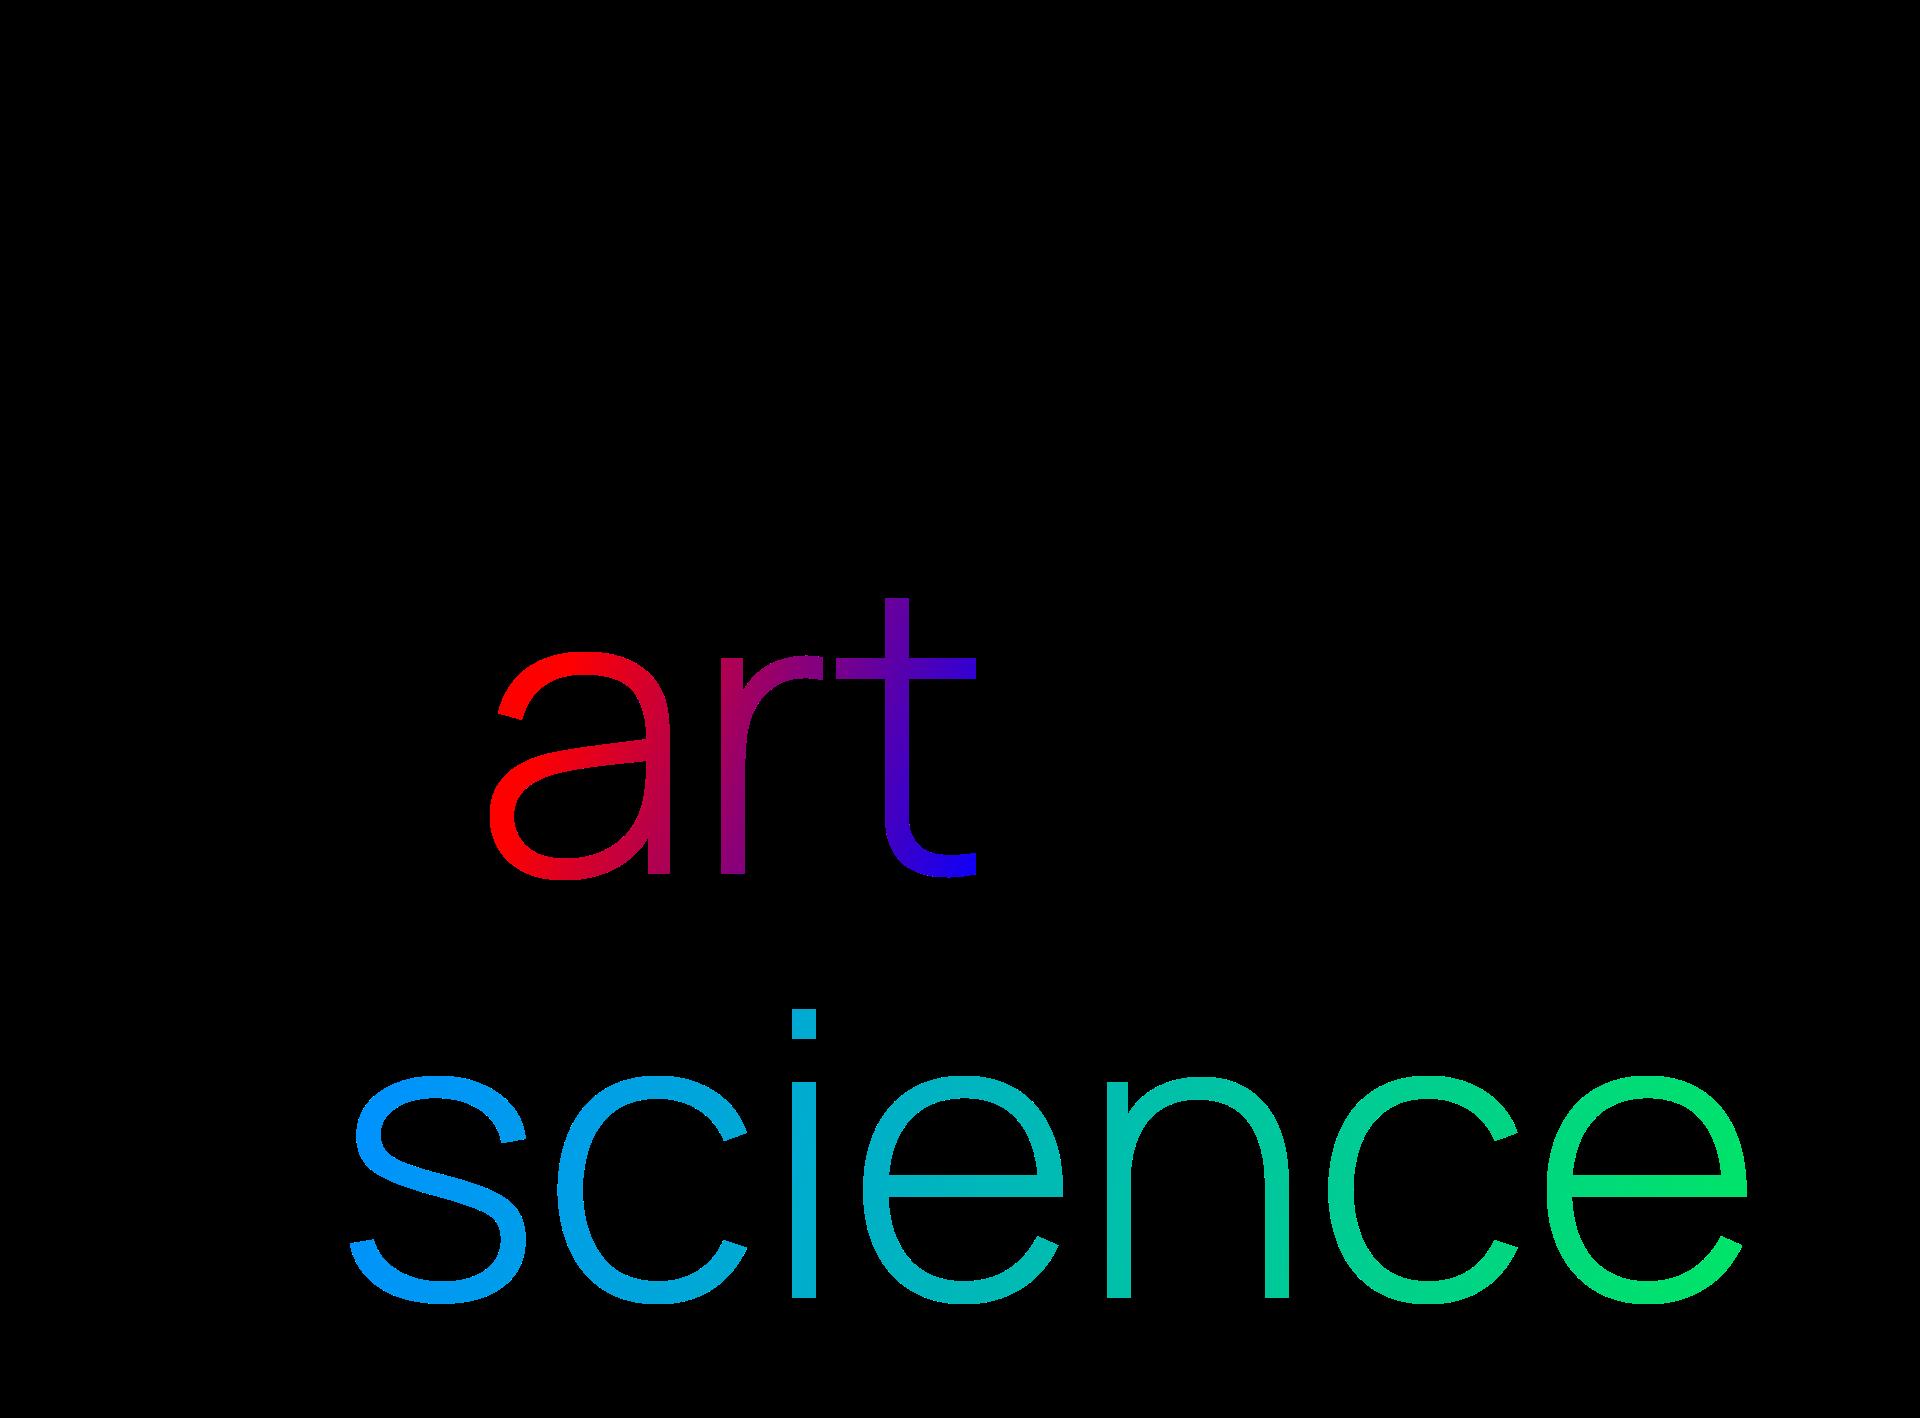 = Capital x (Art + Science)